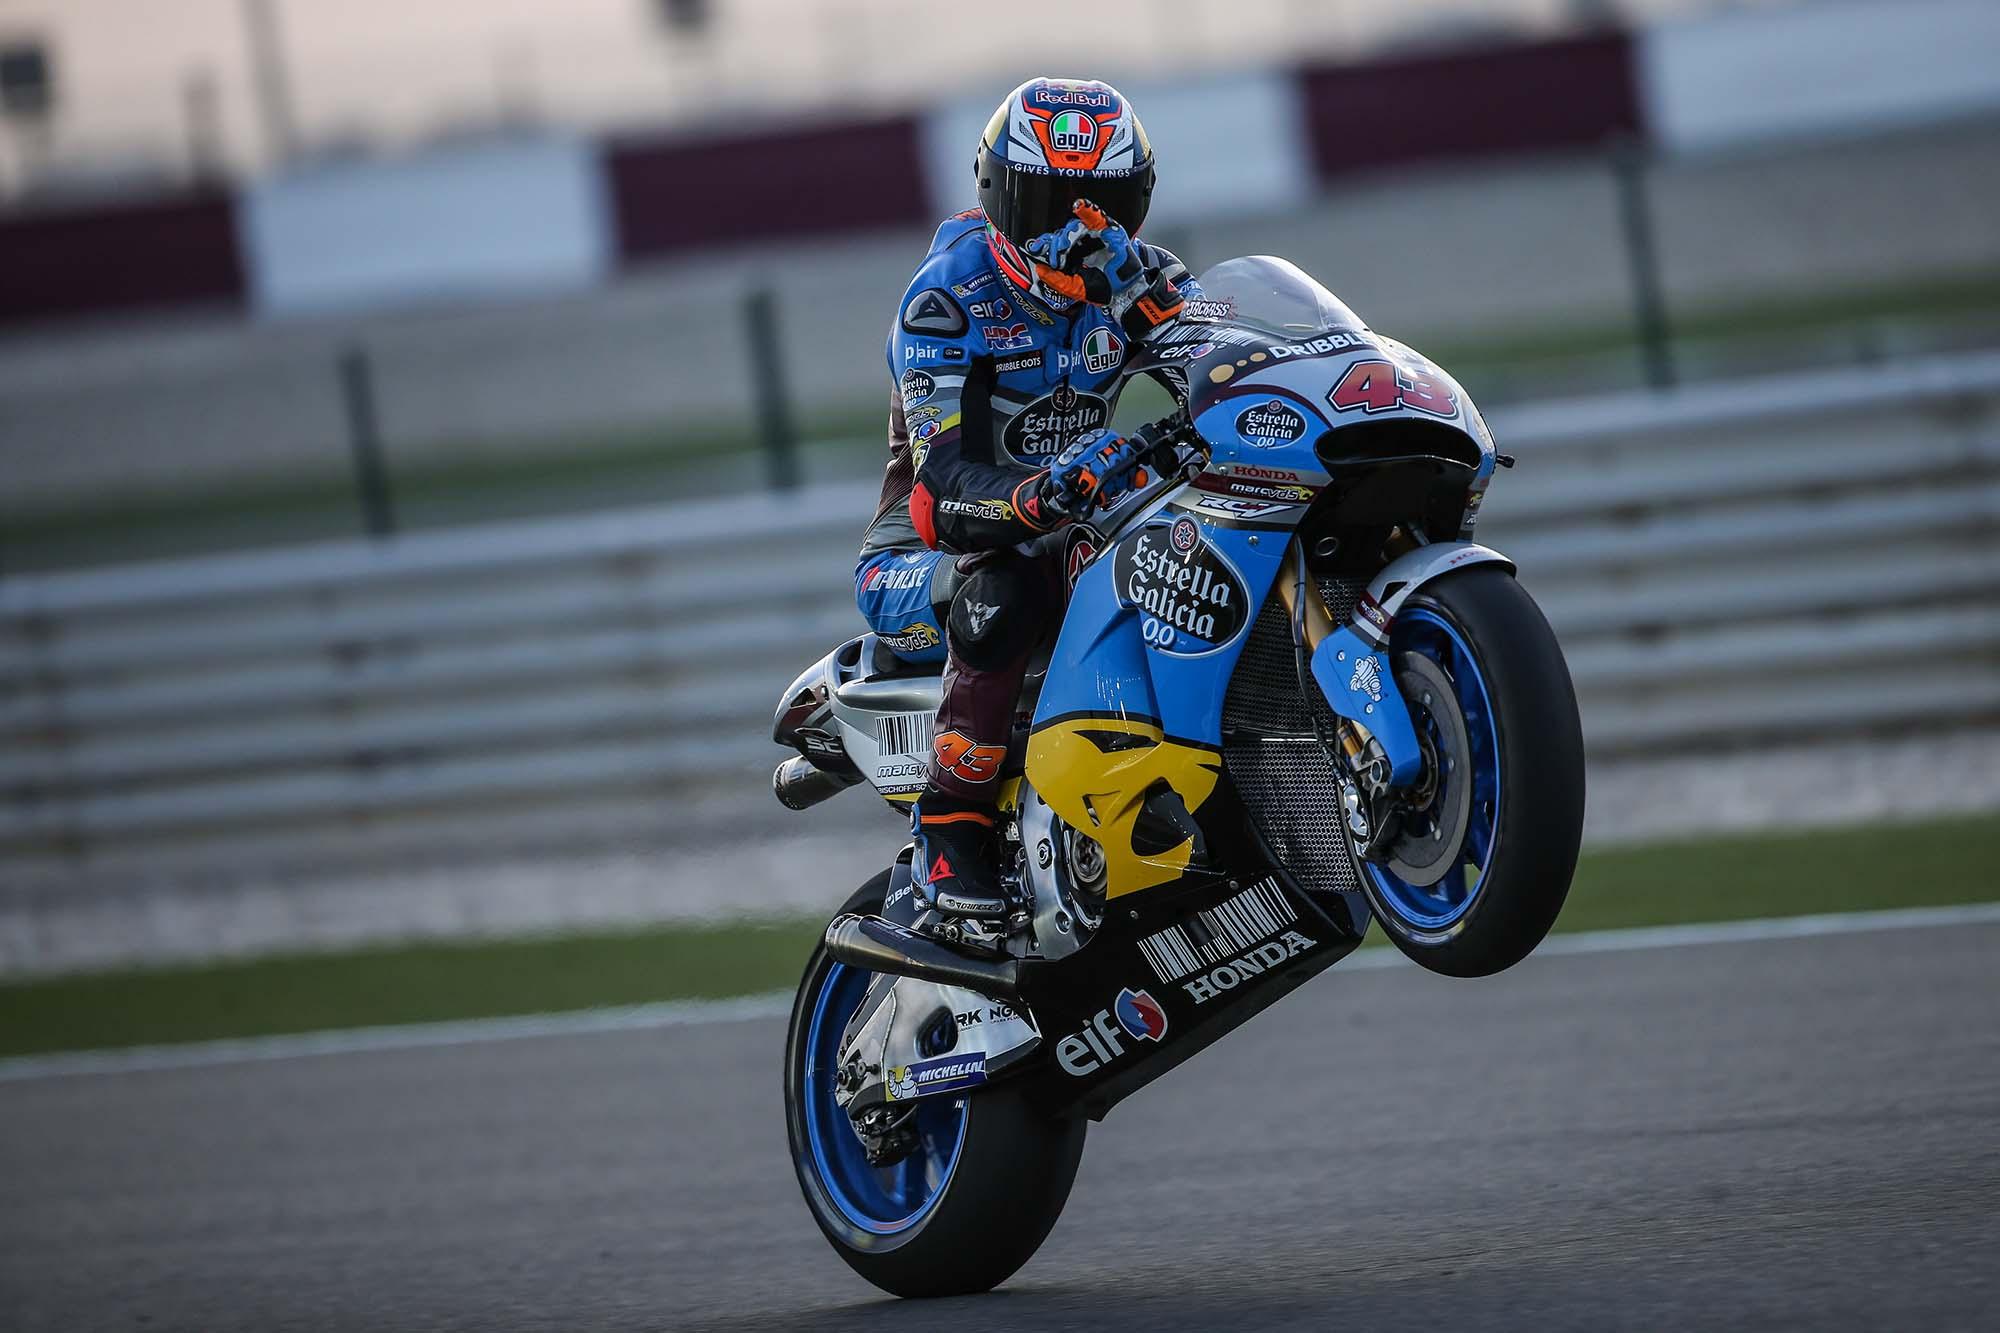 [GP] Qatar - Page 2 MotoGP-Qatar-GP-Sunday-WUP-race-CormacGP-37